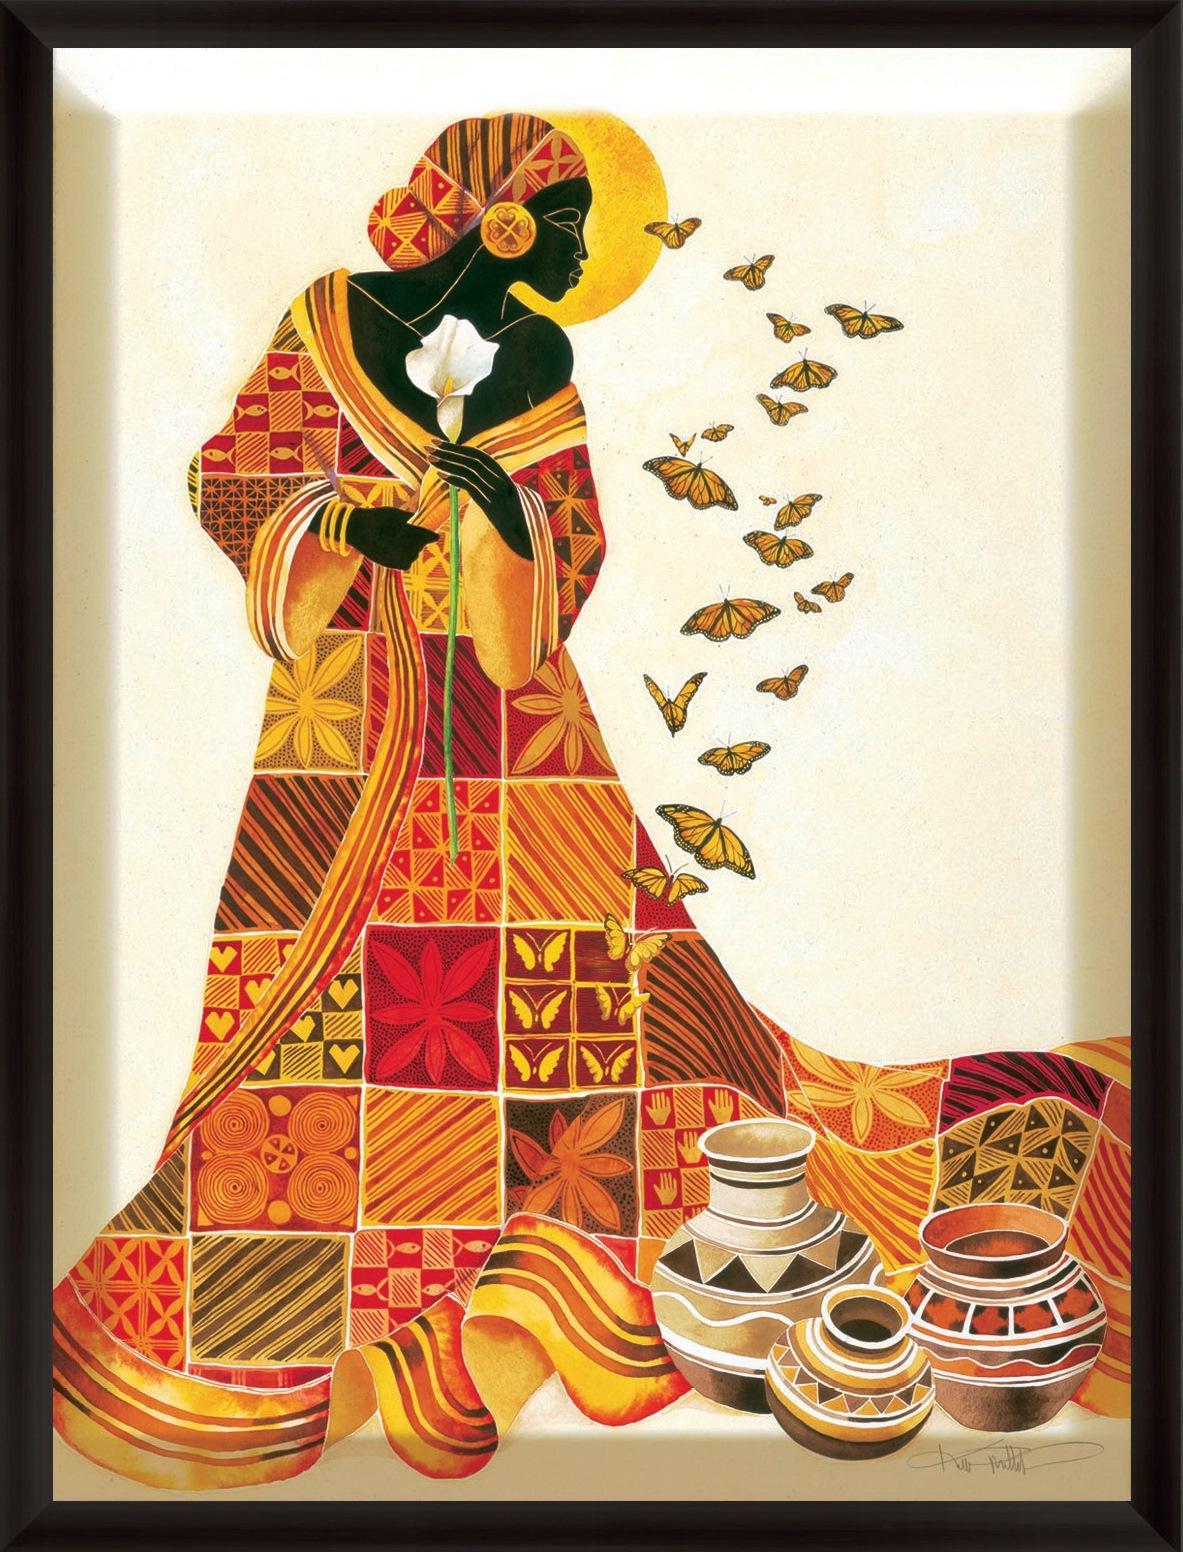 Pintura moderna y fotograf a art stica cuadros africanos - Decorarte pinturas ...